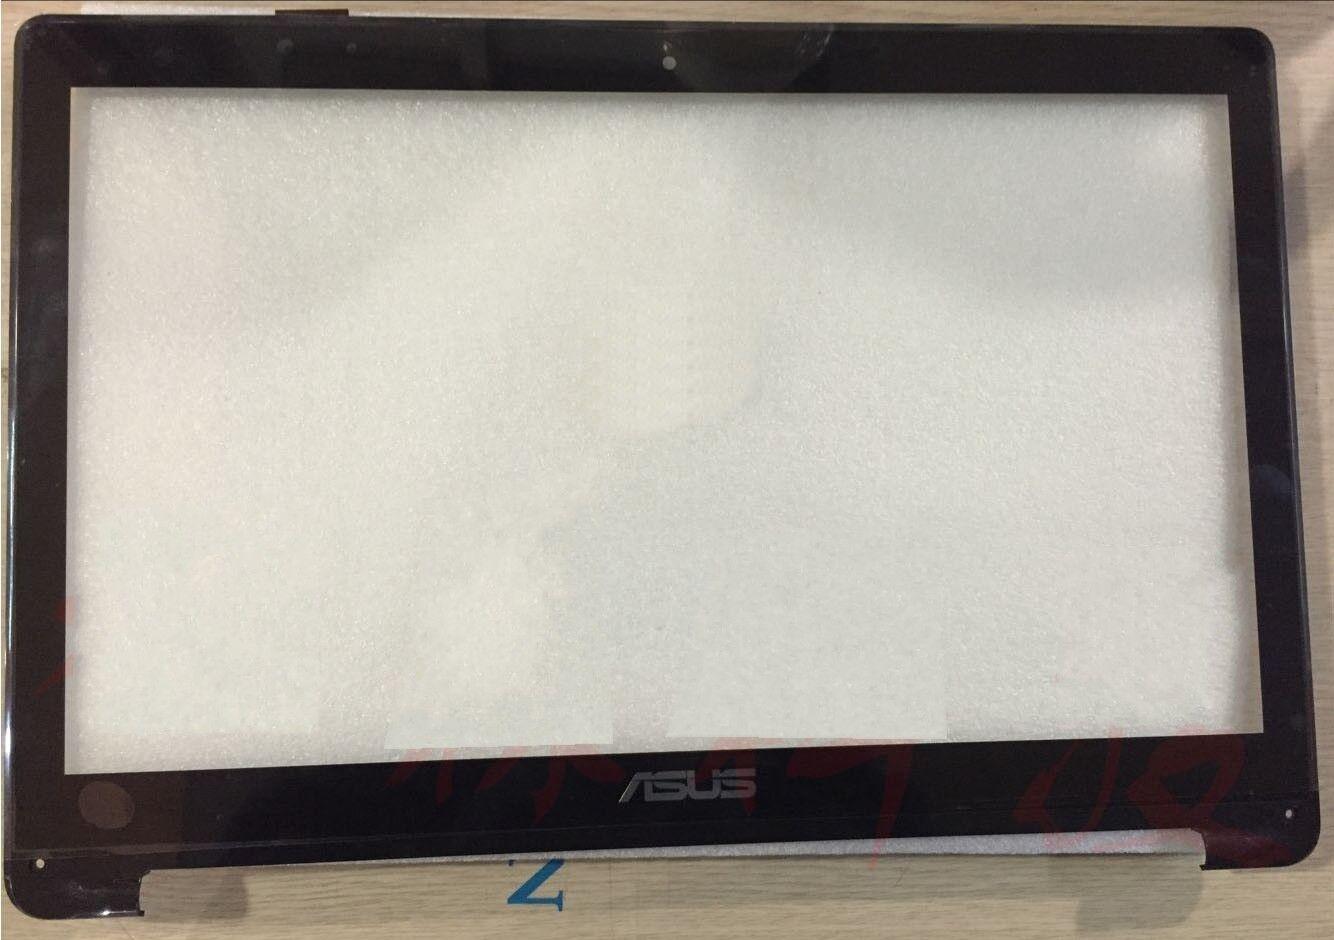 JYLTK New Genuine 11.6 HD LCD Screen Display Bezel Frame Touch Digitizer Glass Touch Control Board Assembly Fit HP Pavilion X360 11-ad026TU 11-ad027TU 11-ad028TU 11-ad029TU 11-ad030TU